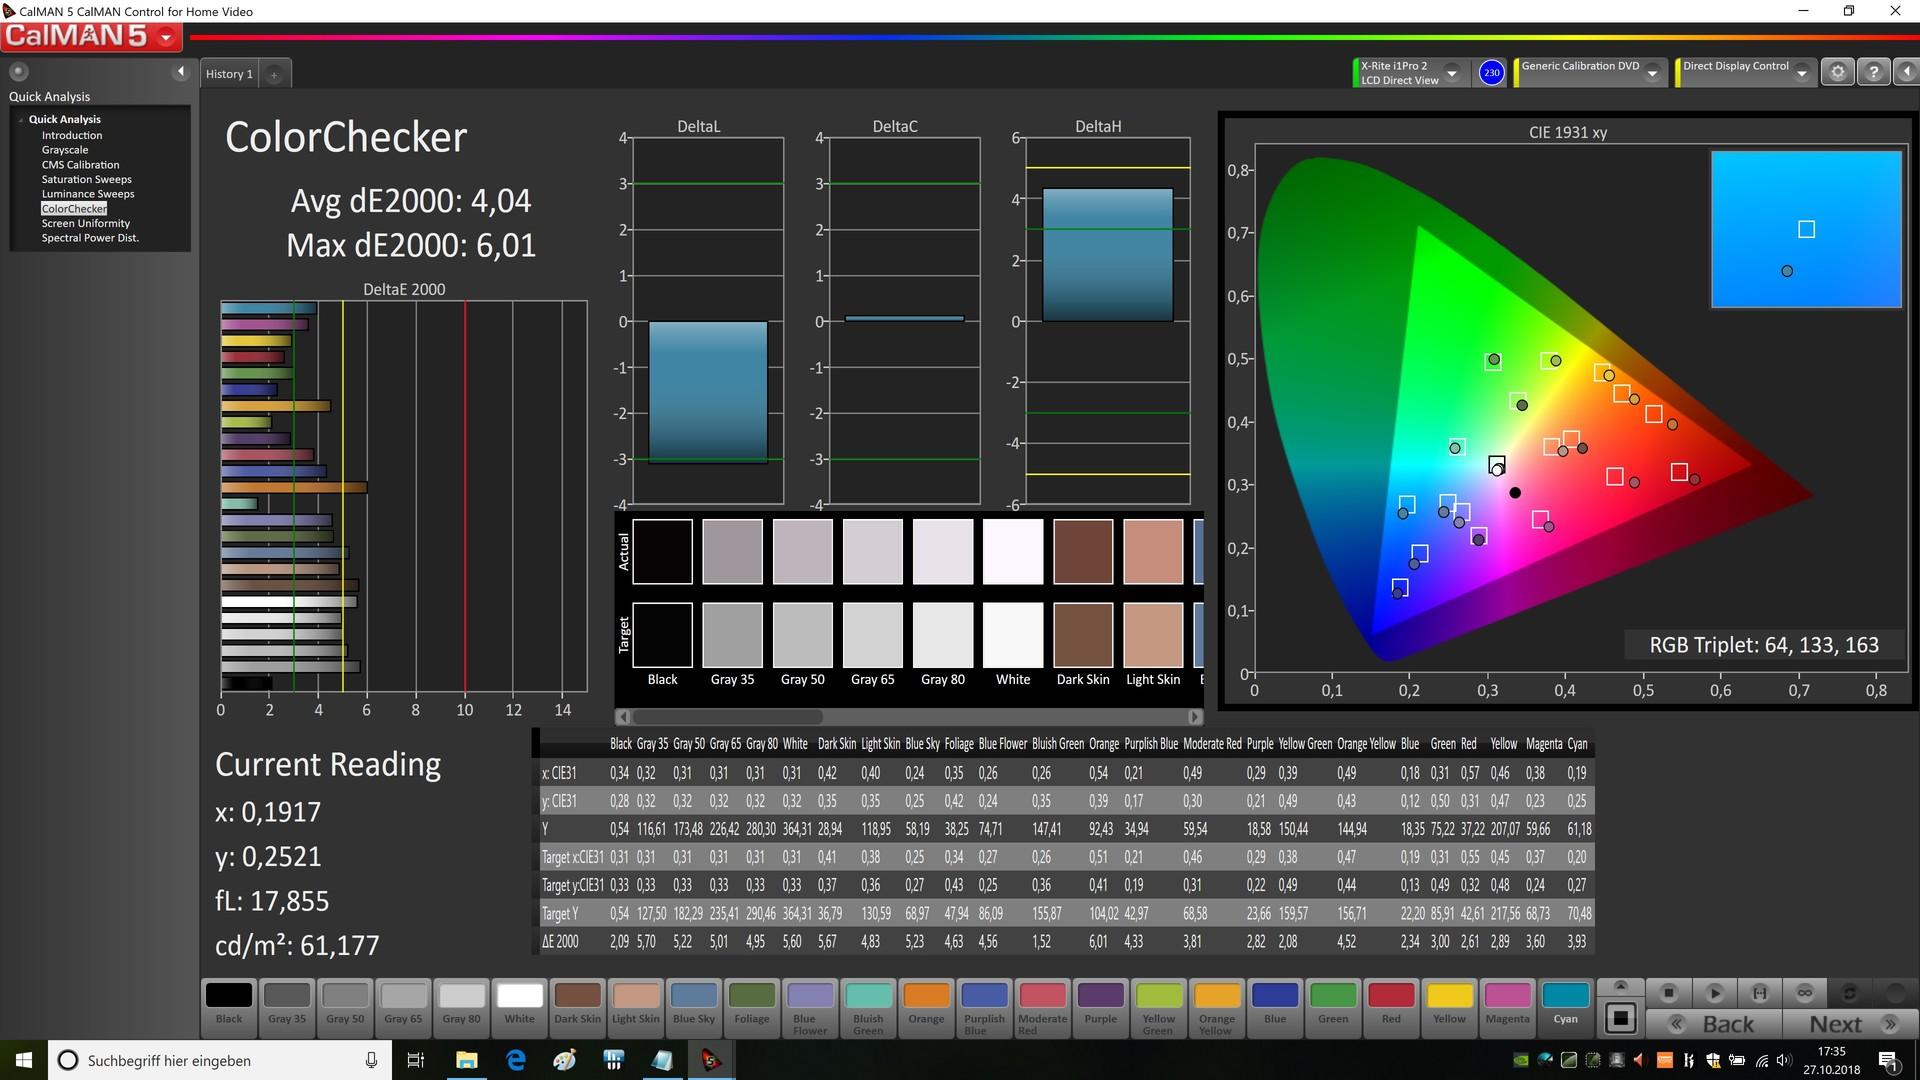 Schenker XMG Ultra 17 (i9-9900K, GTX 1080, UHD) Clevo